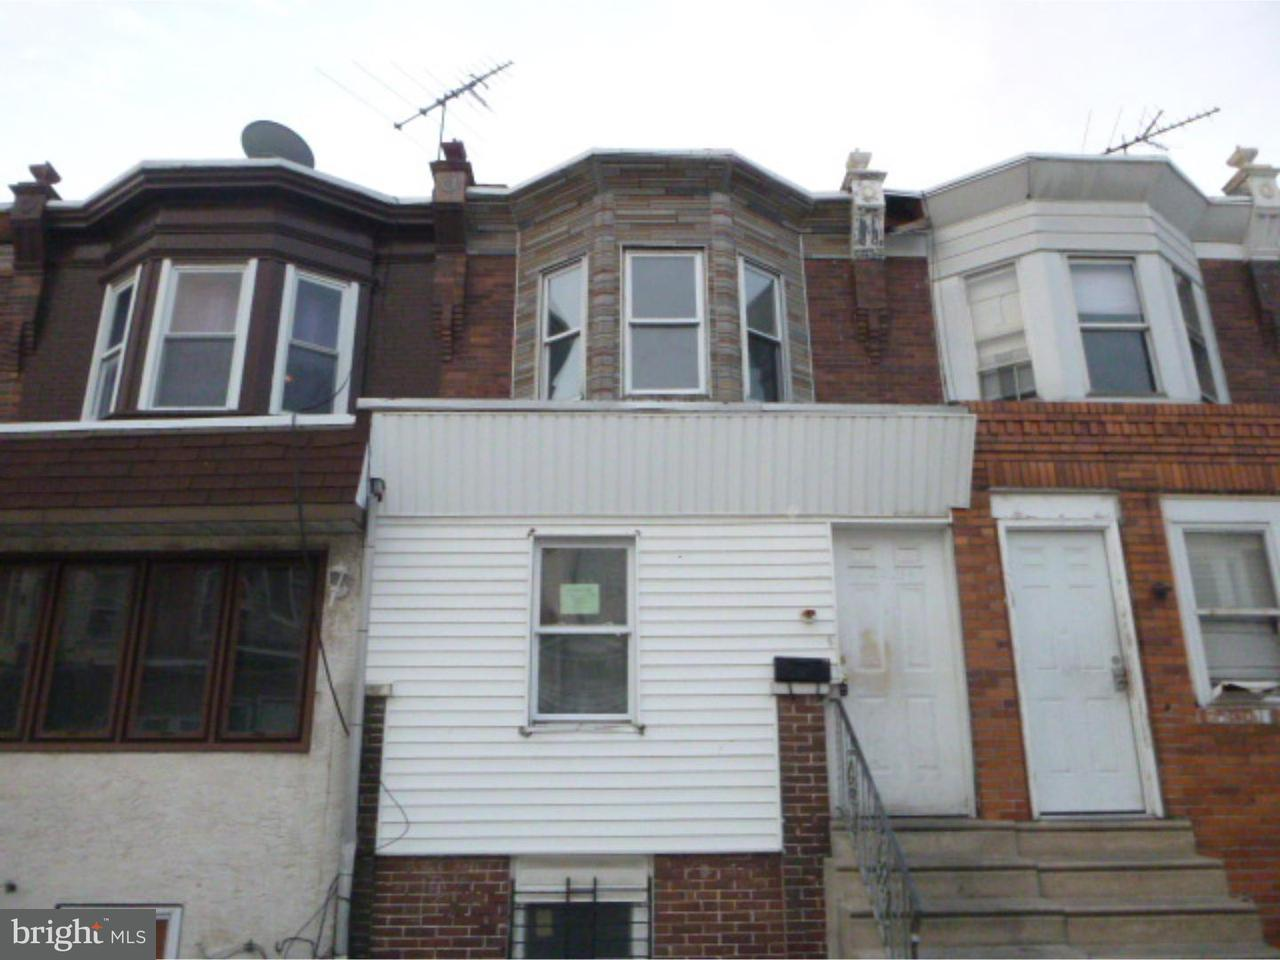 2224  Bonaffon Philadelphia, PA 19142